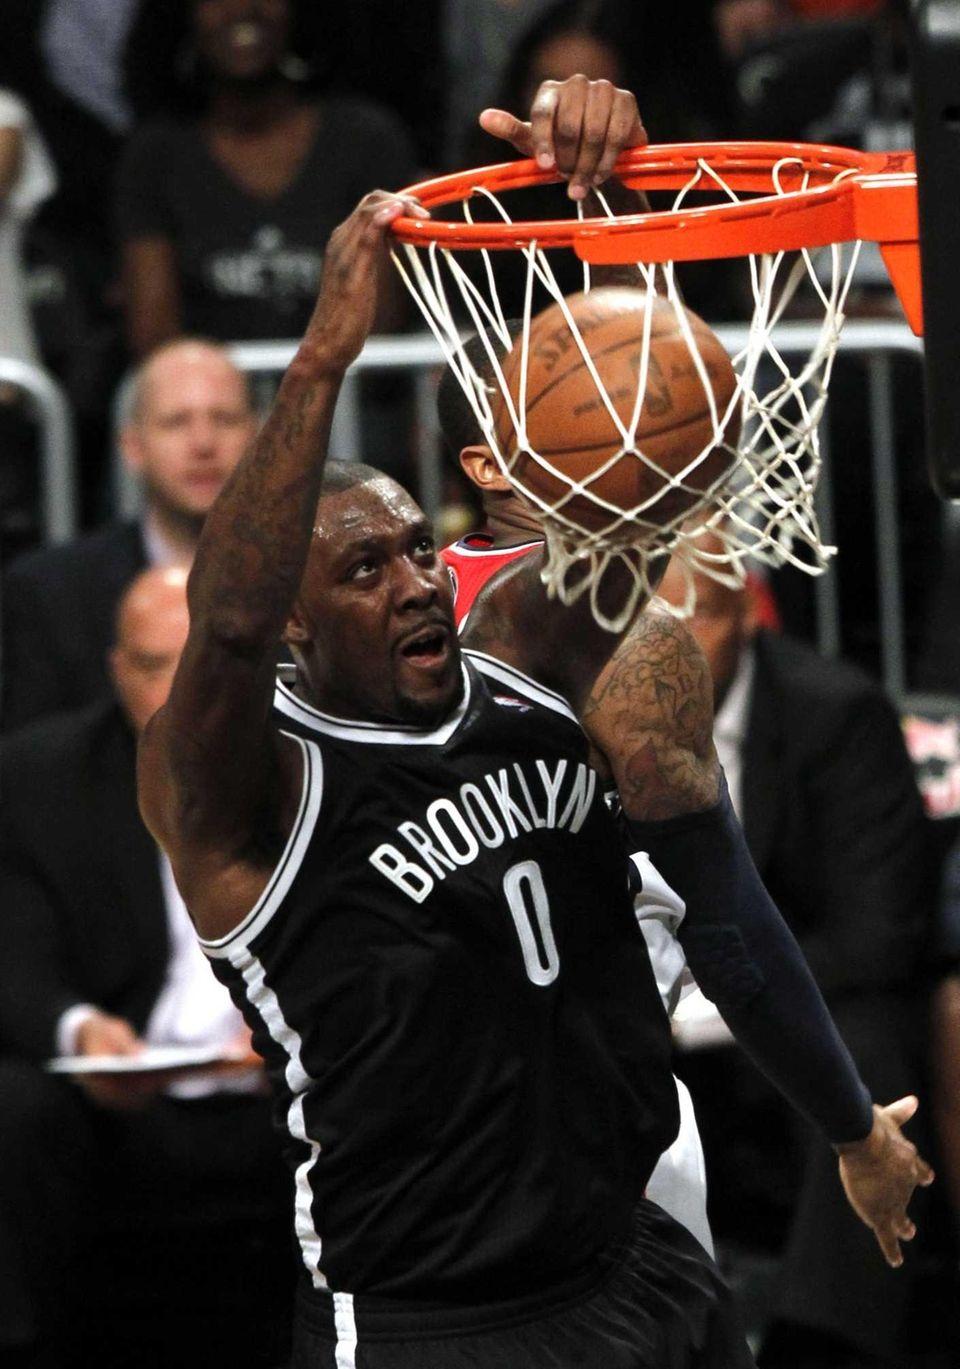 Andray Blatche dunks during an NBA preseason basketball